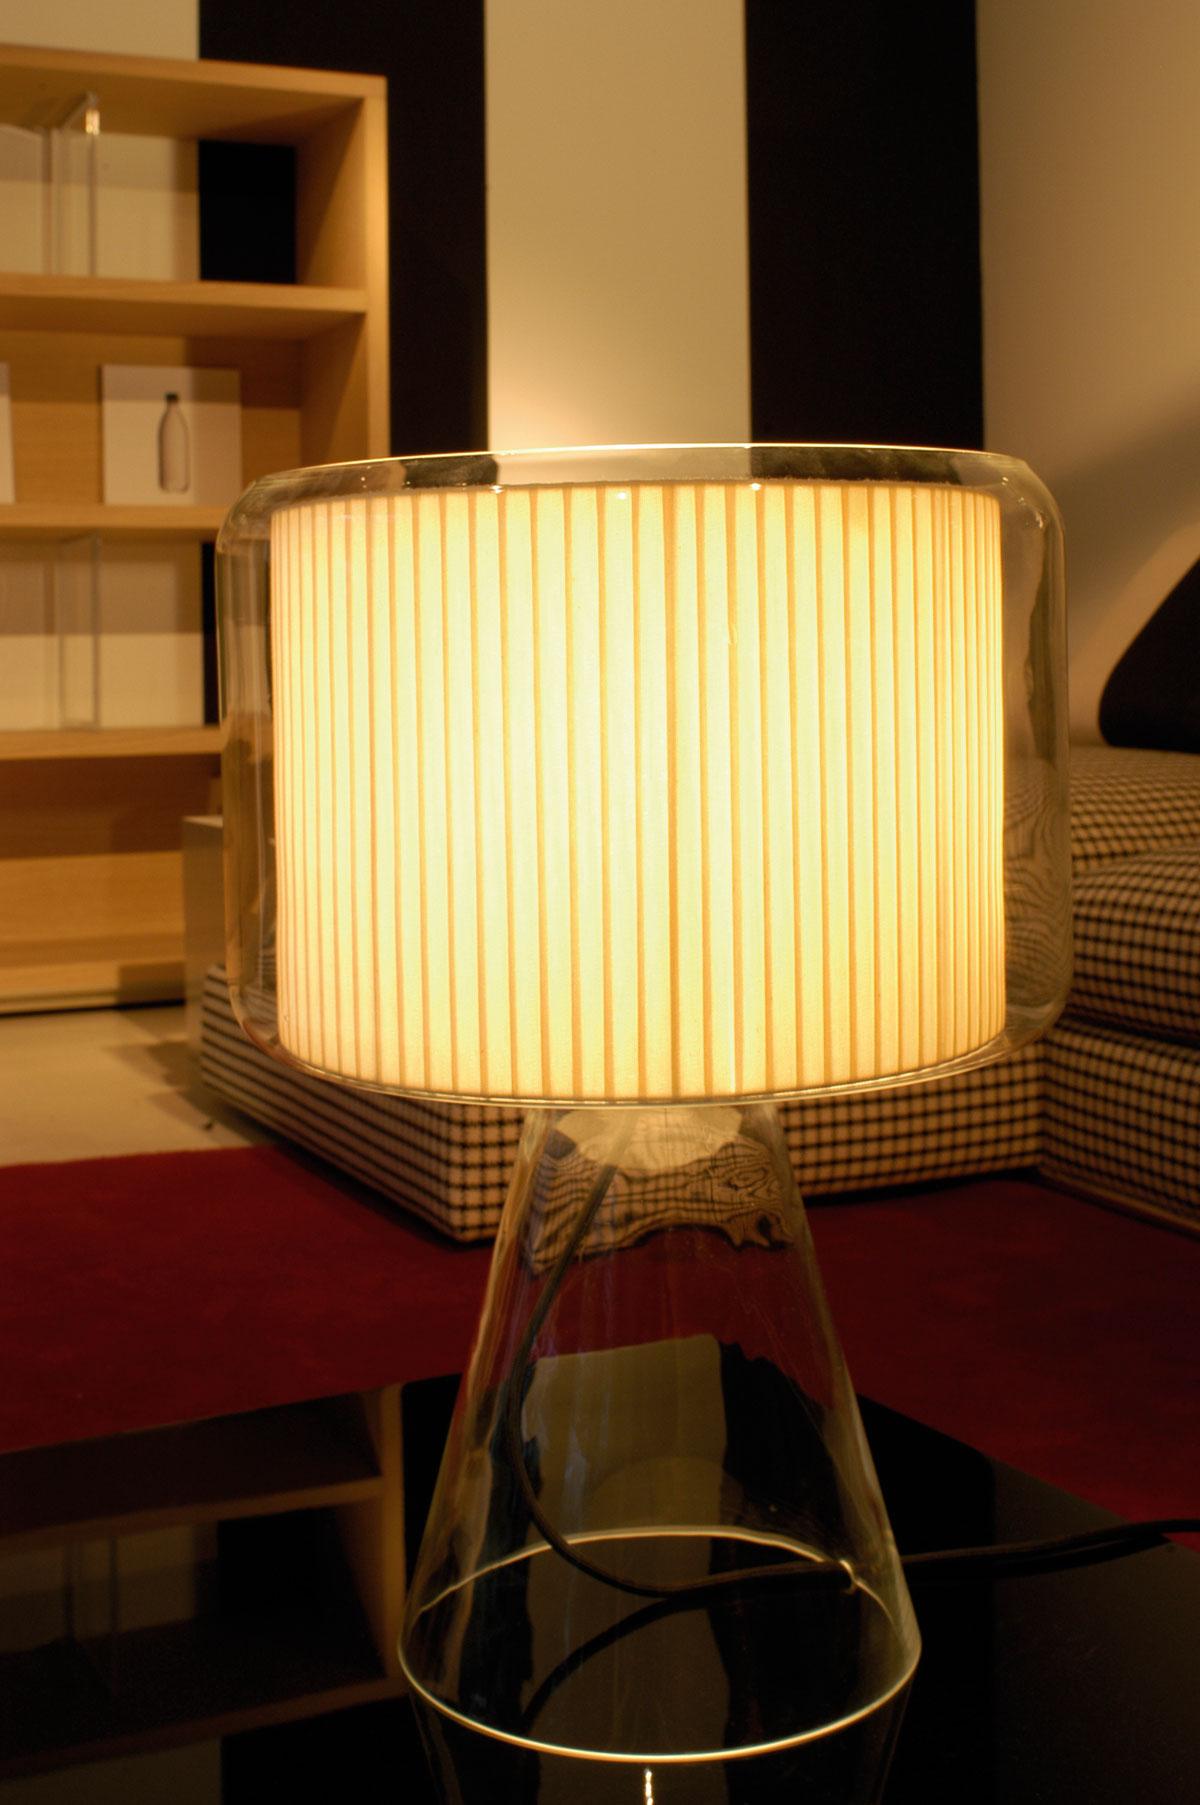 Mercer lampe ruban beige GM. Marset.